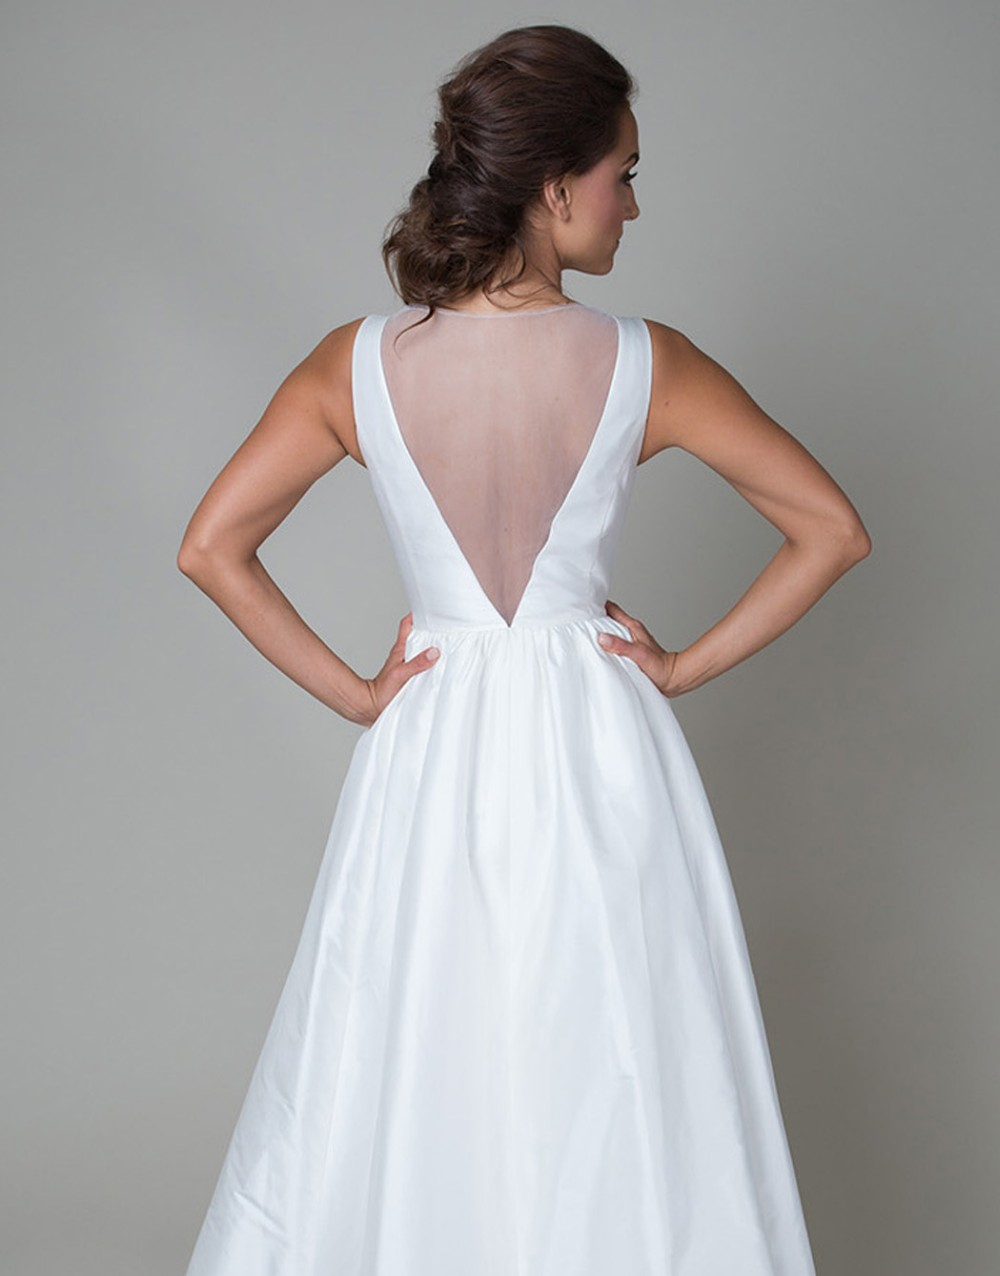 Vintage long white summer boho beach wedding dress with pockets 2015 v neck see through bridal gowns vestidos de noiva UD-442 5